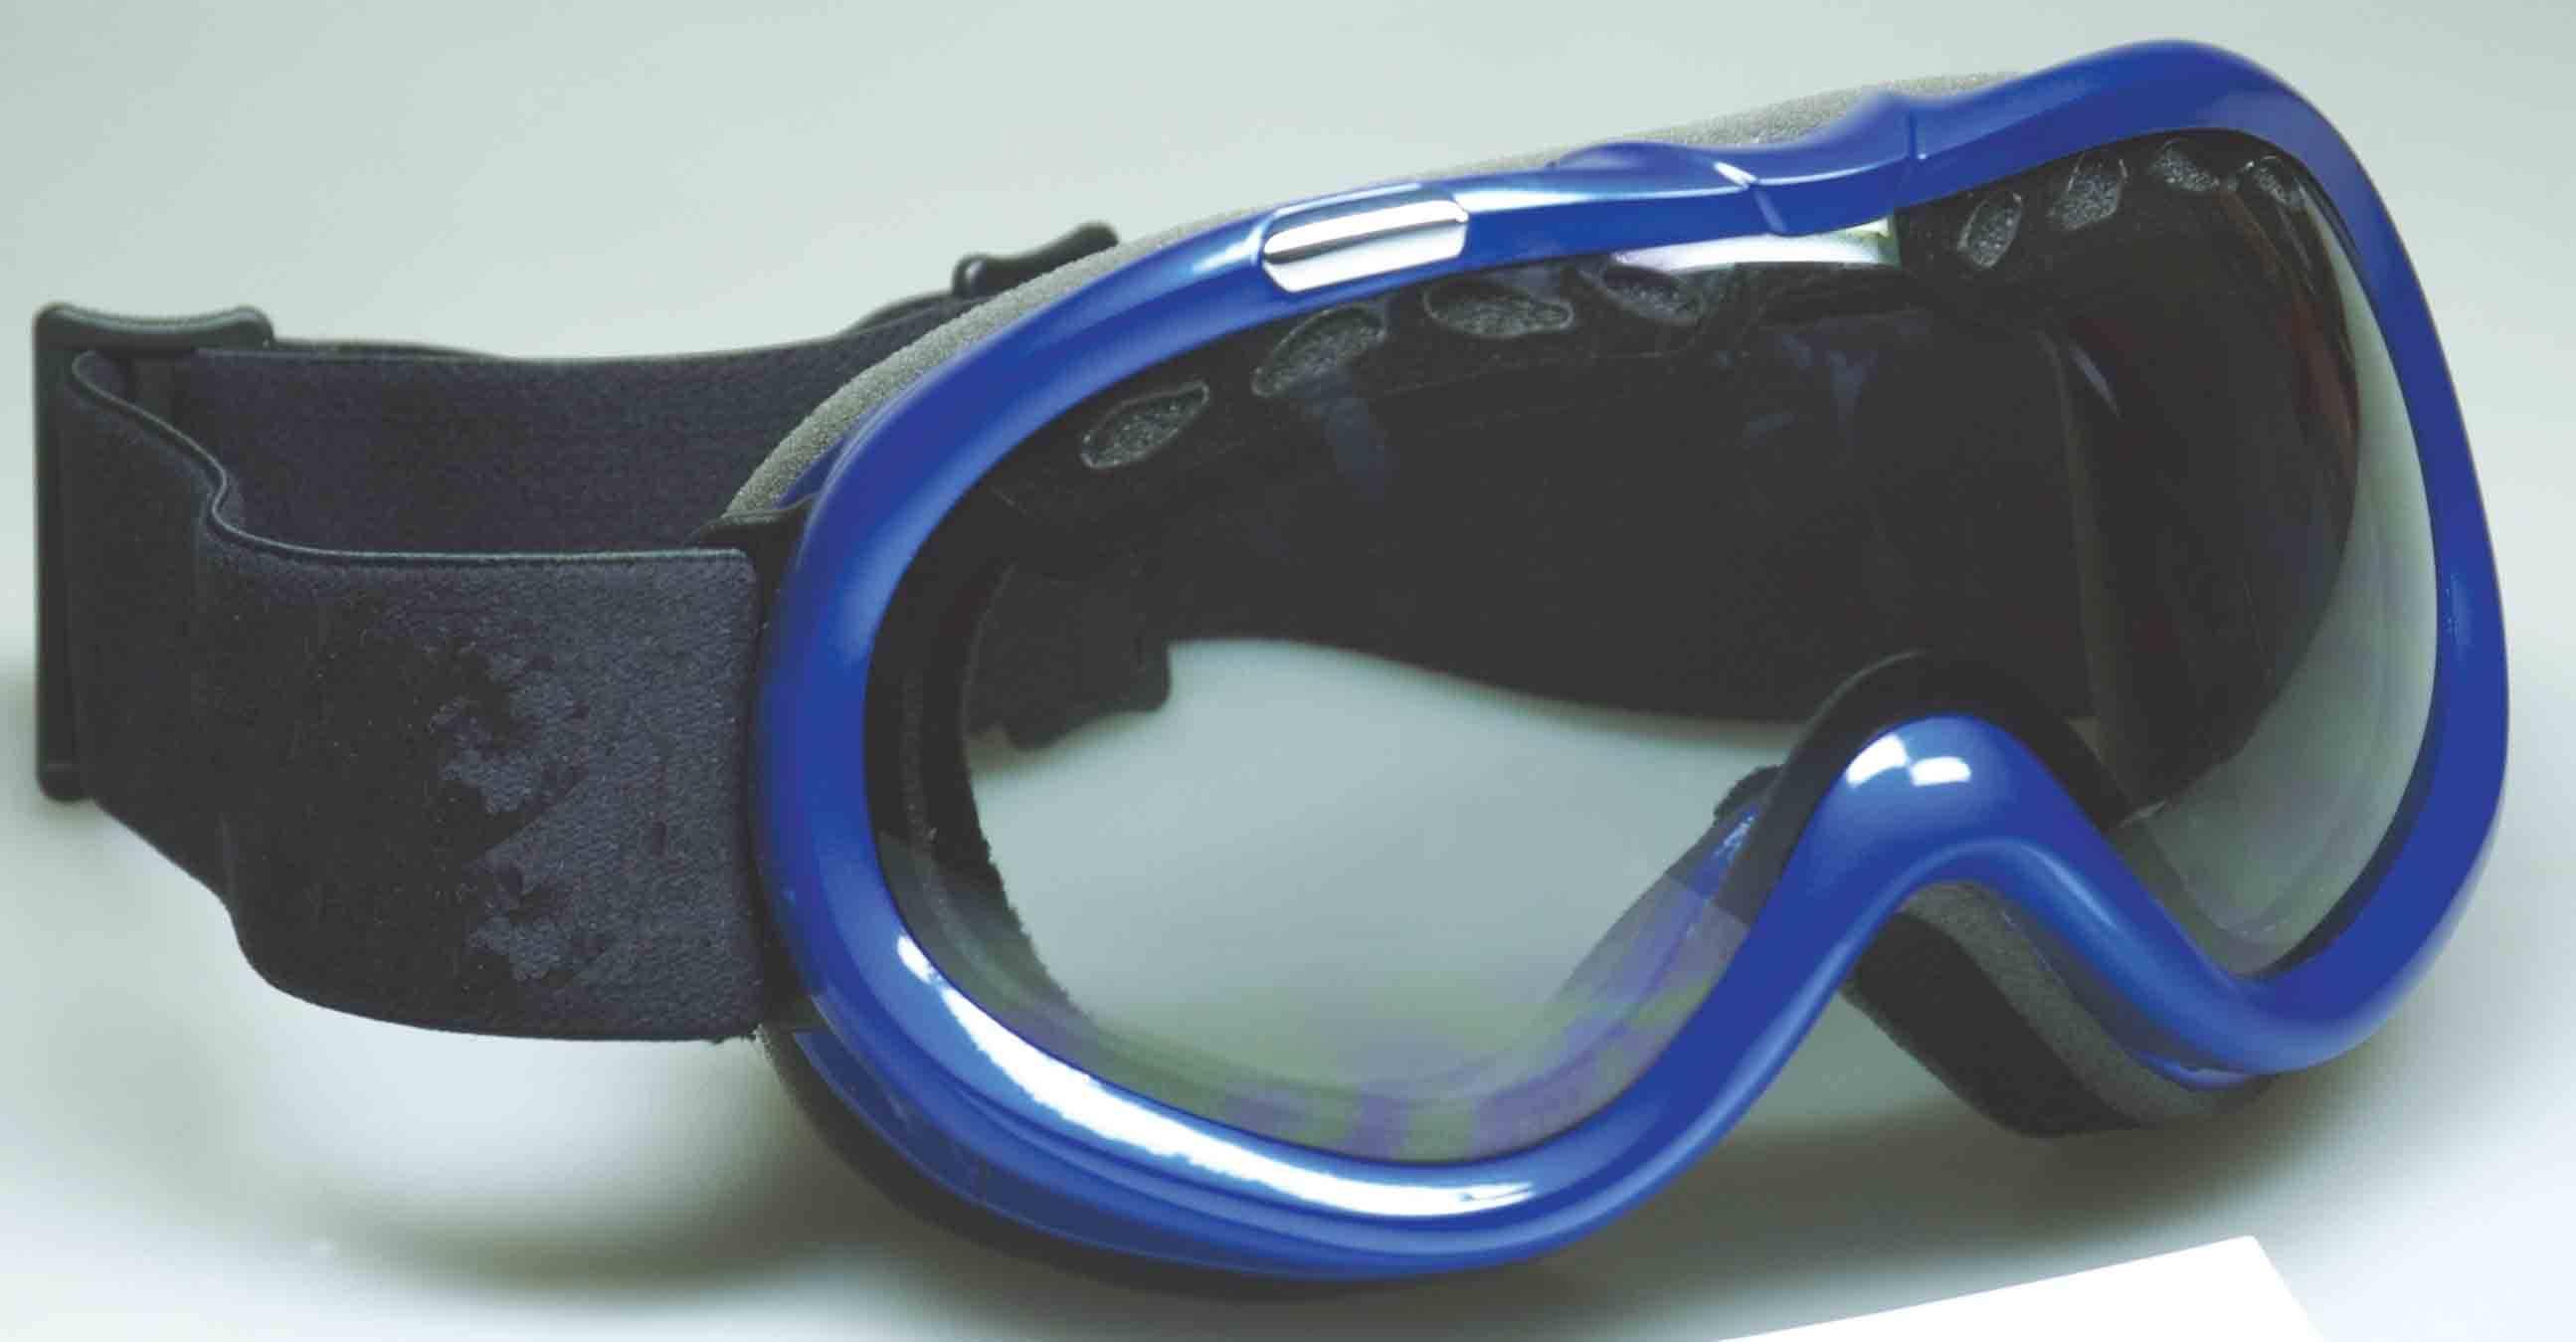 Super large lens ski goggle